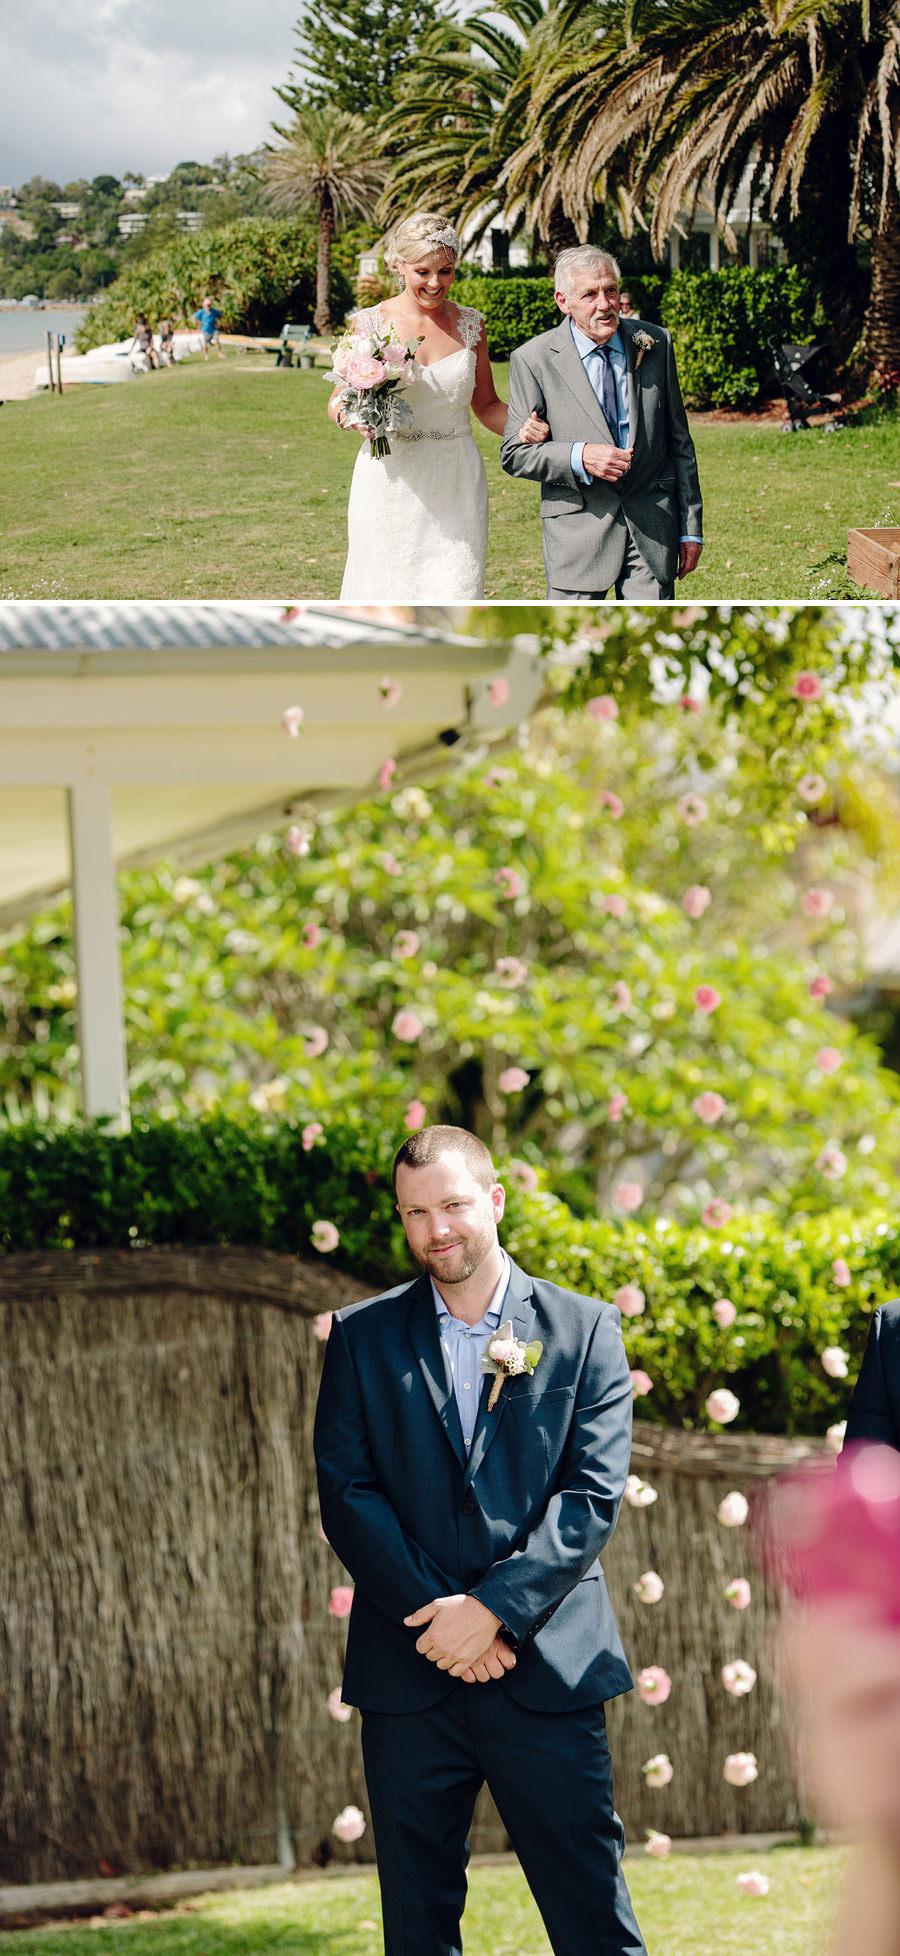 Contemporary Wedding Photographer: Ceremony